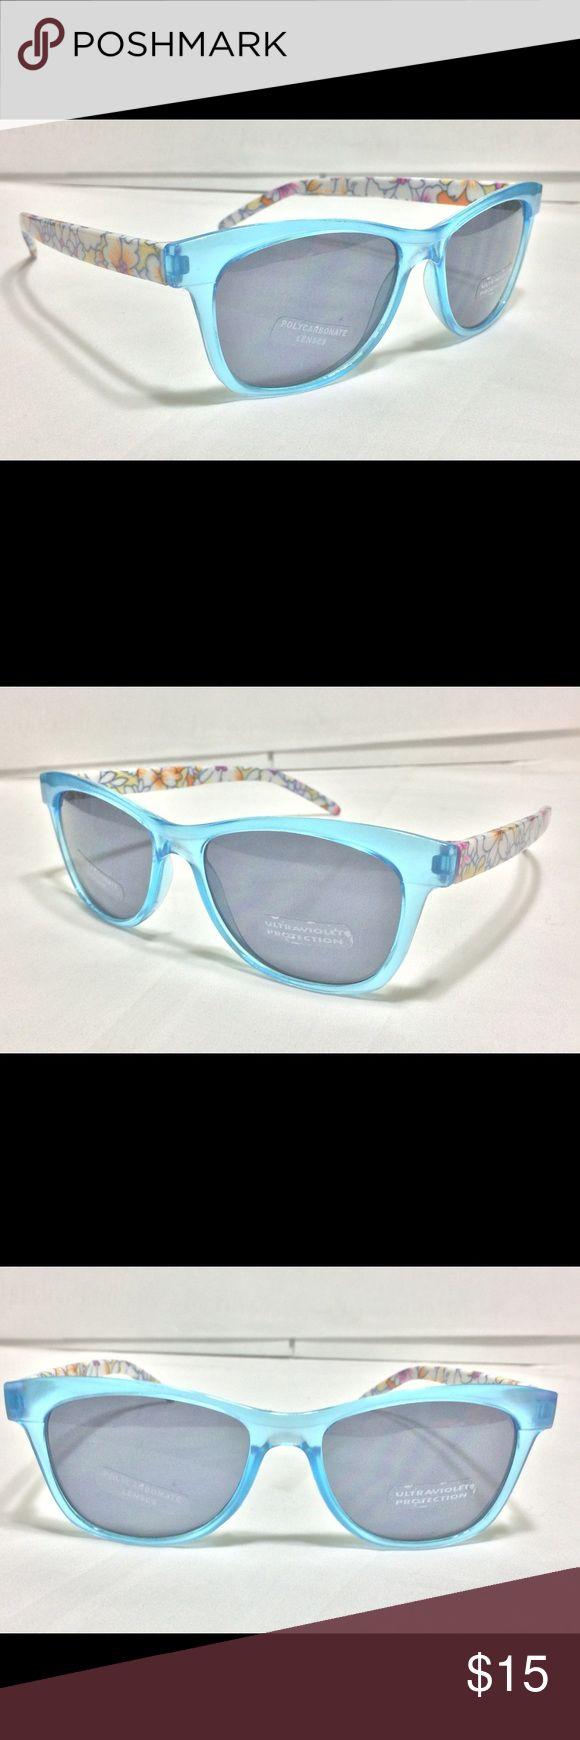 🕶🆕 Ladies Polycarbonate 100% UV Sunglasses 🆕🕶 🕶🆕 Ladies Polycarbonate 100% UV Sunglasses 🆕🕶 - Will include various accessories for sunglasses, including a case. Accessories Sunglasses